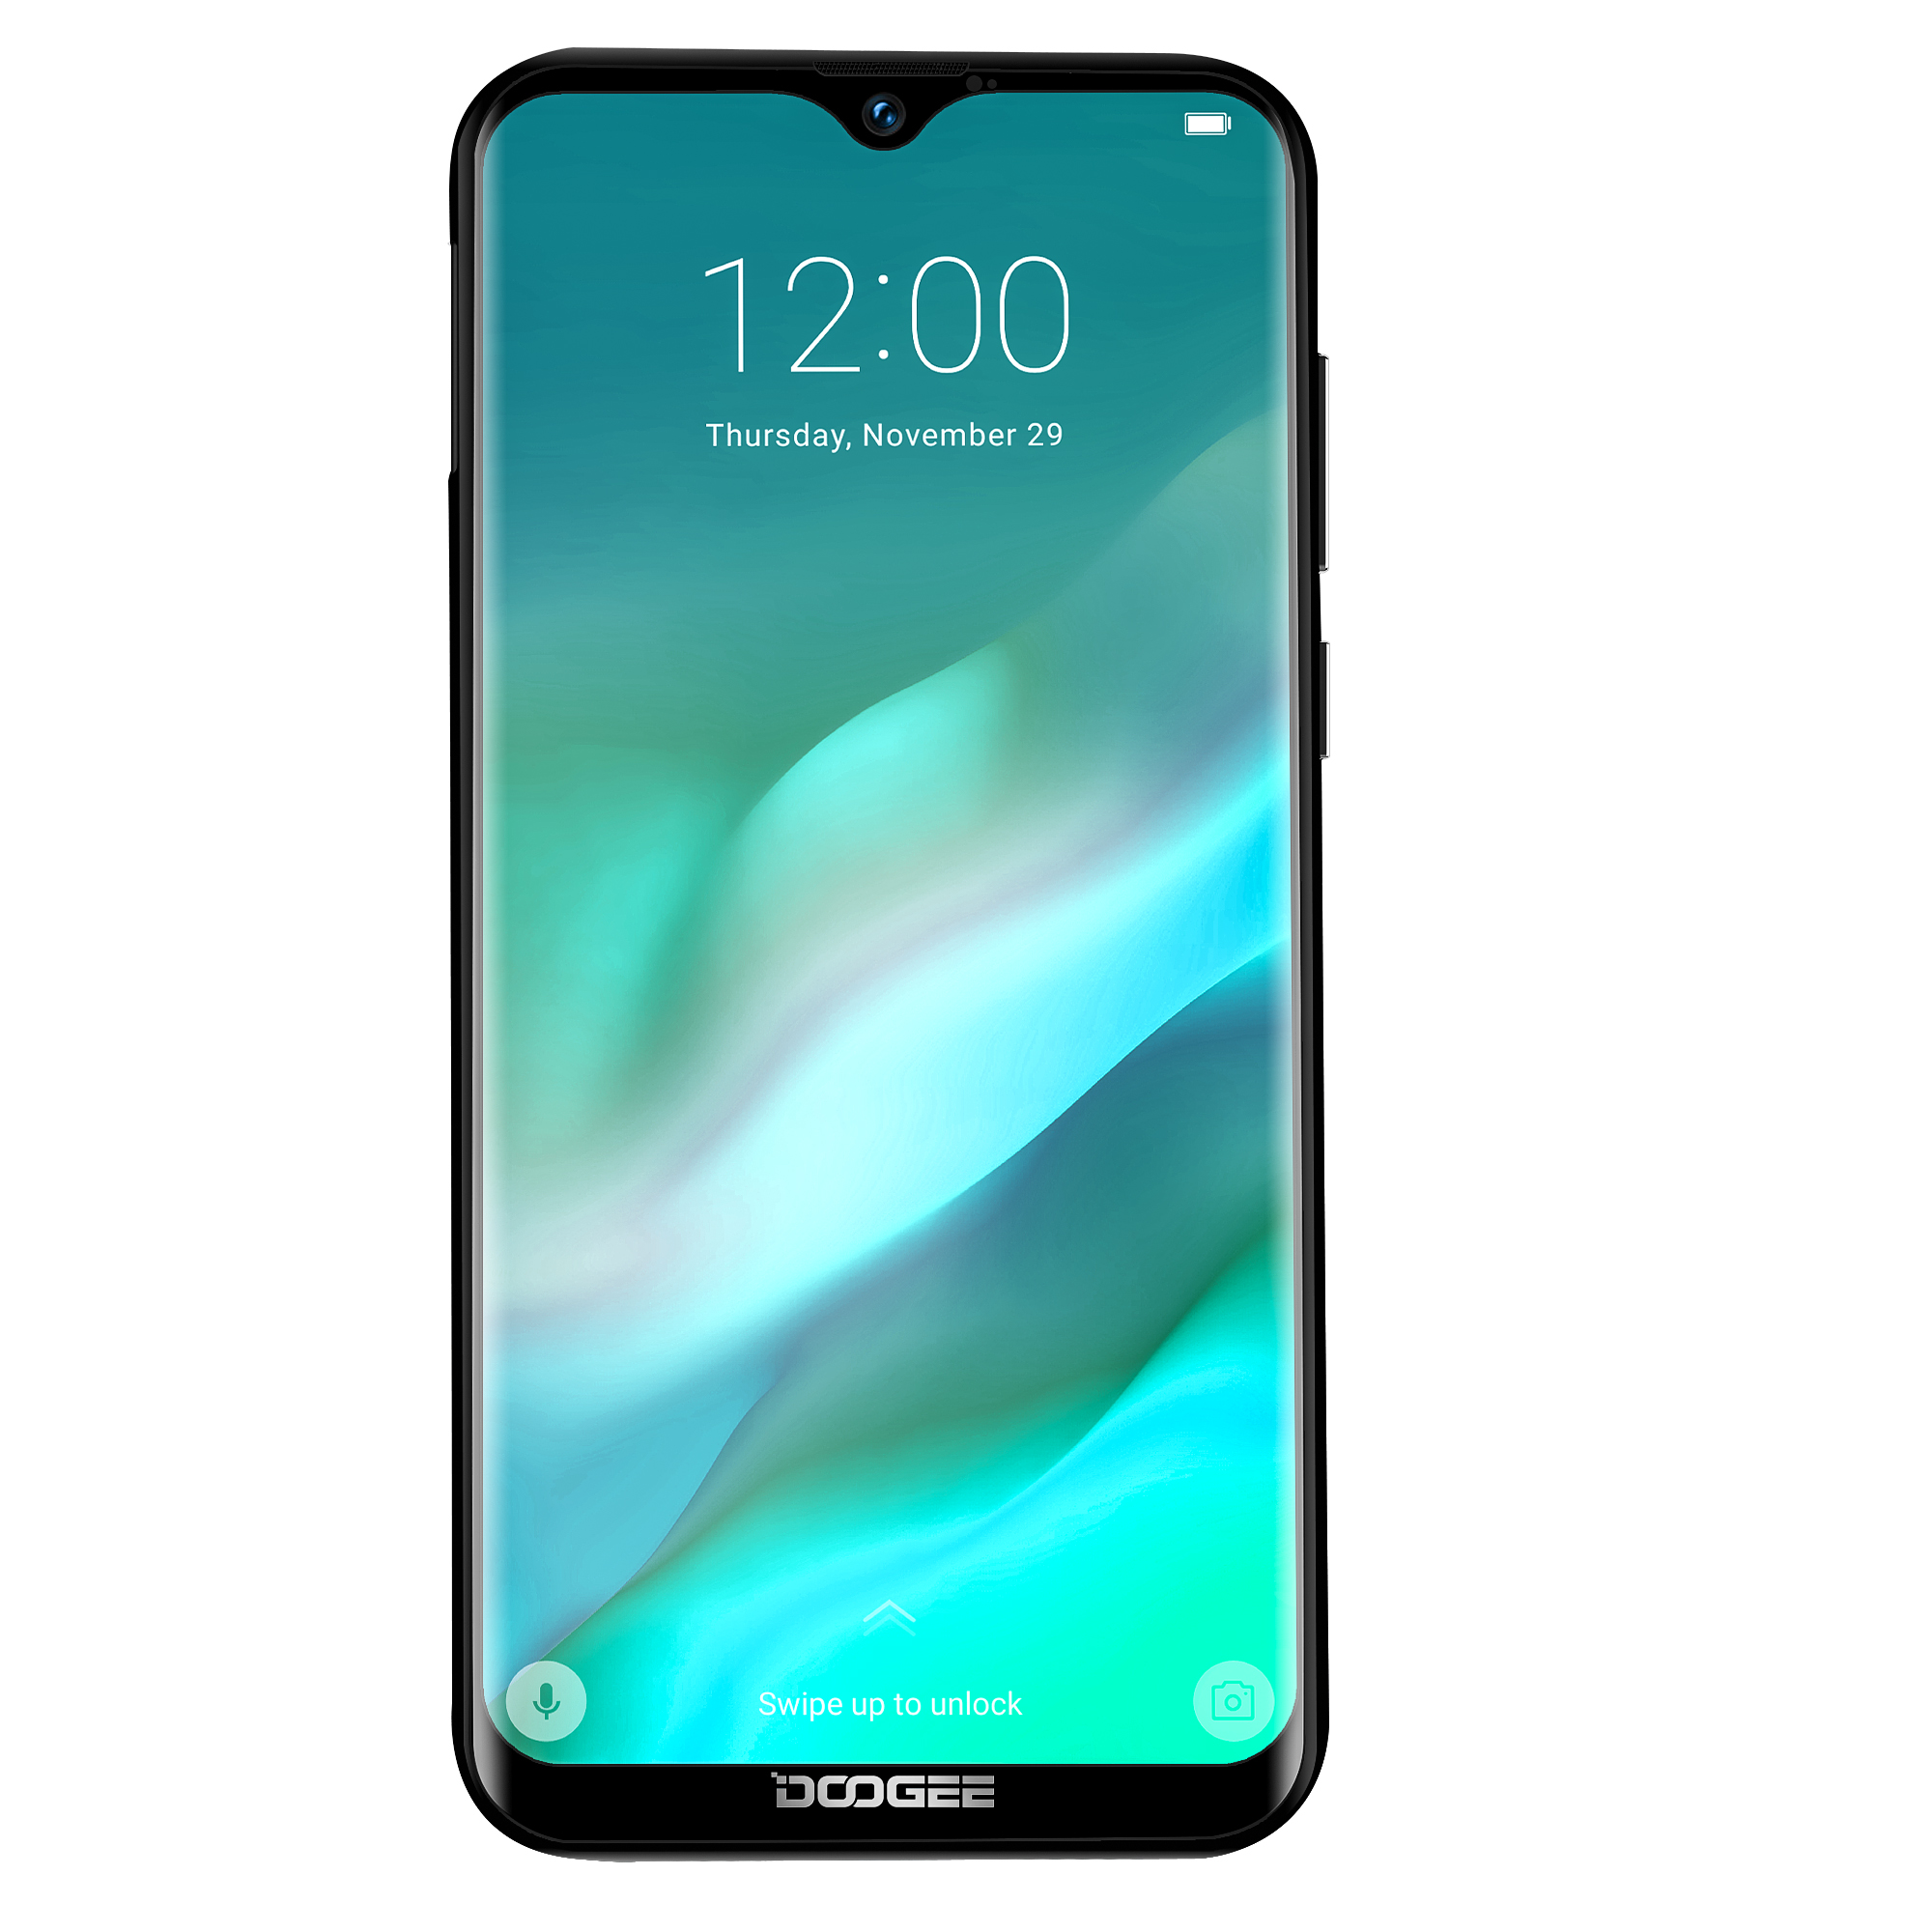 DOOGEE Y8 FDD LTE Telefone Android 9.0 Celular Smartphone com Tela de 6.1 polegada 19:9 LTPS Waterdrop MTK6739 3GB RAM 32GB ROM 3400mAh Dual SIM